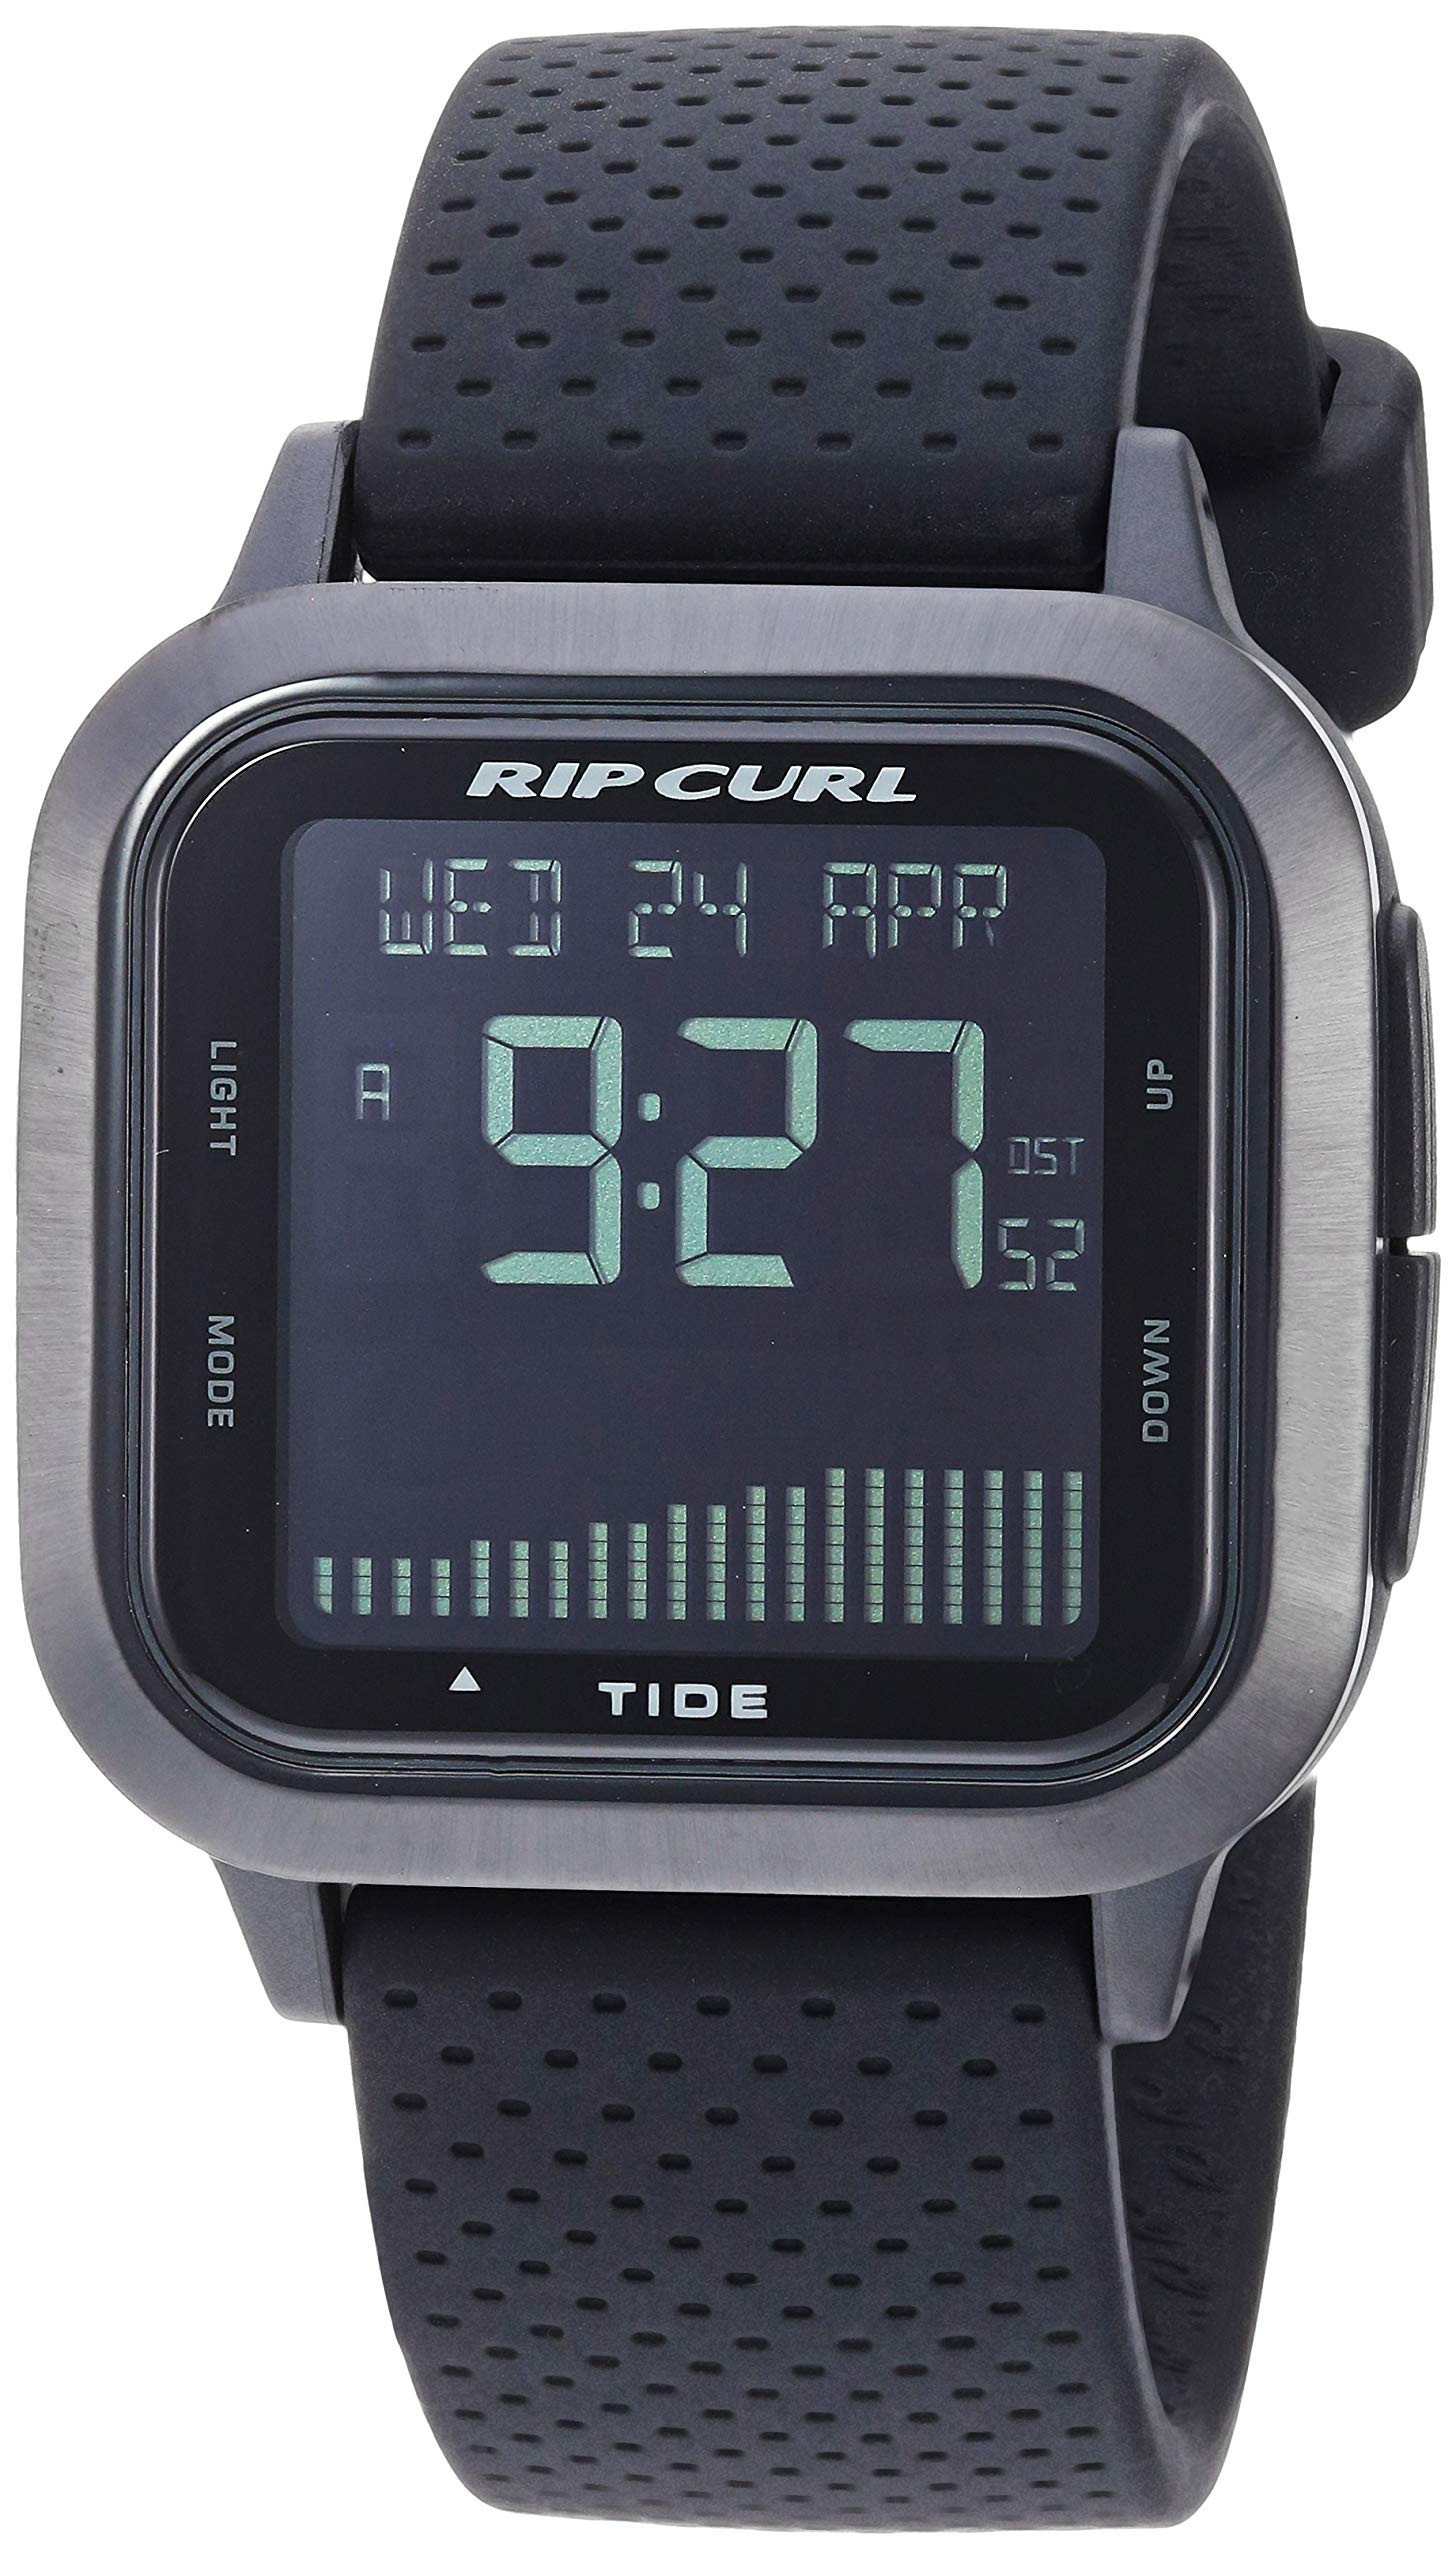 Rip Curl Men's Quartz Sport Watch with Silicone Strap, Black, 21.9 (Model: A1137MID1SZ)